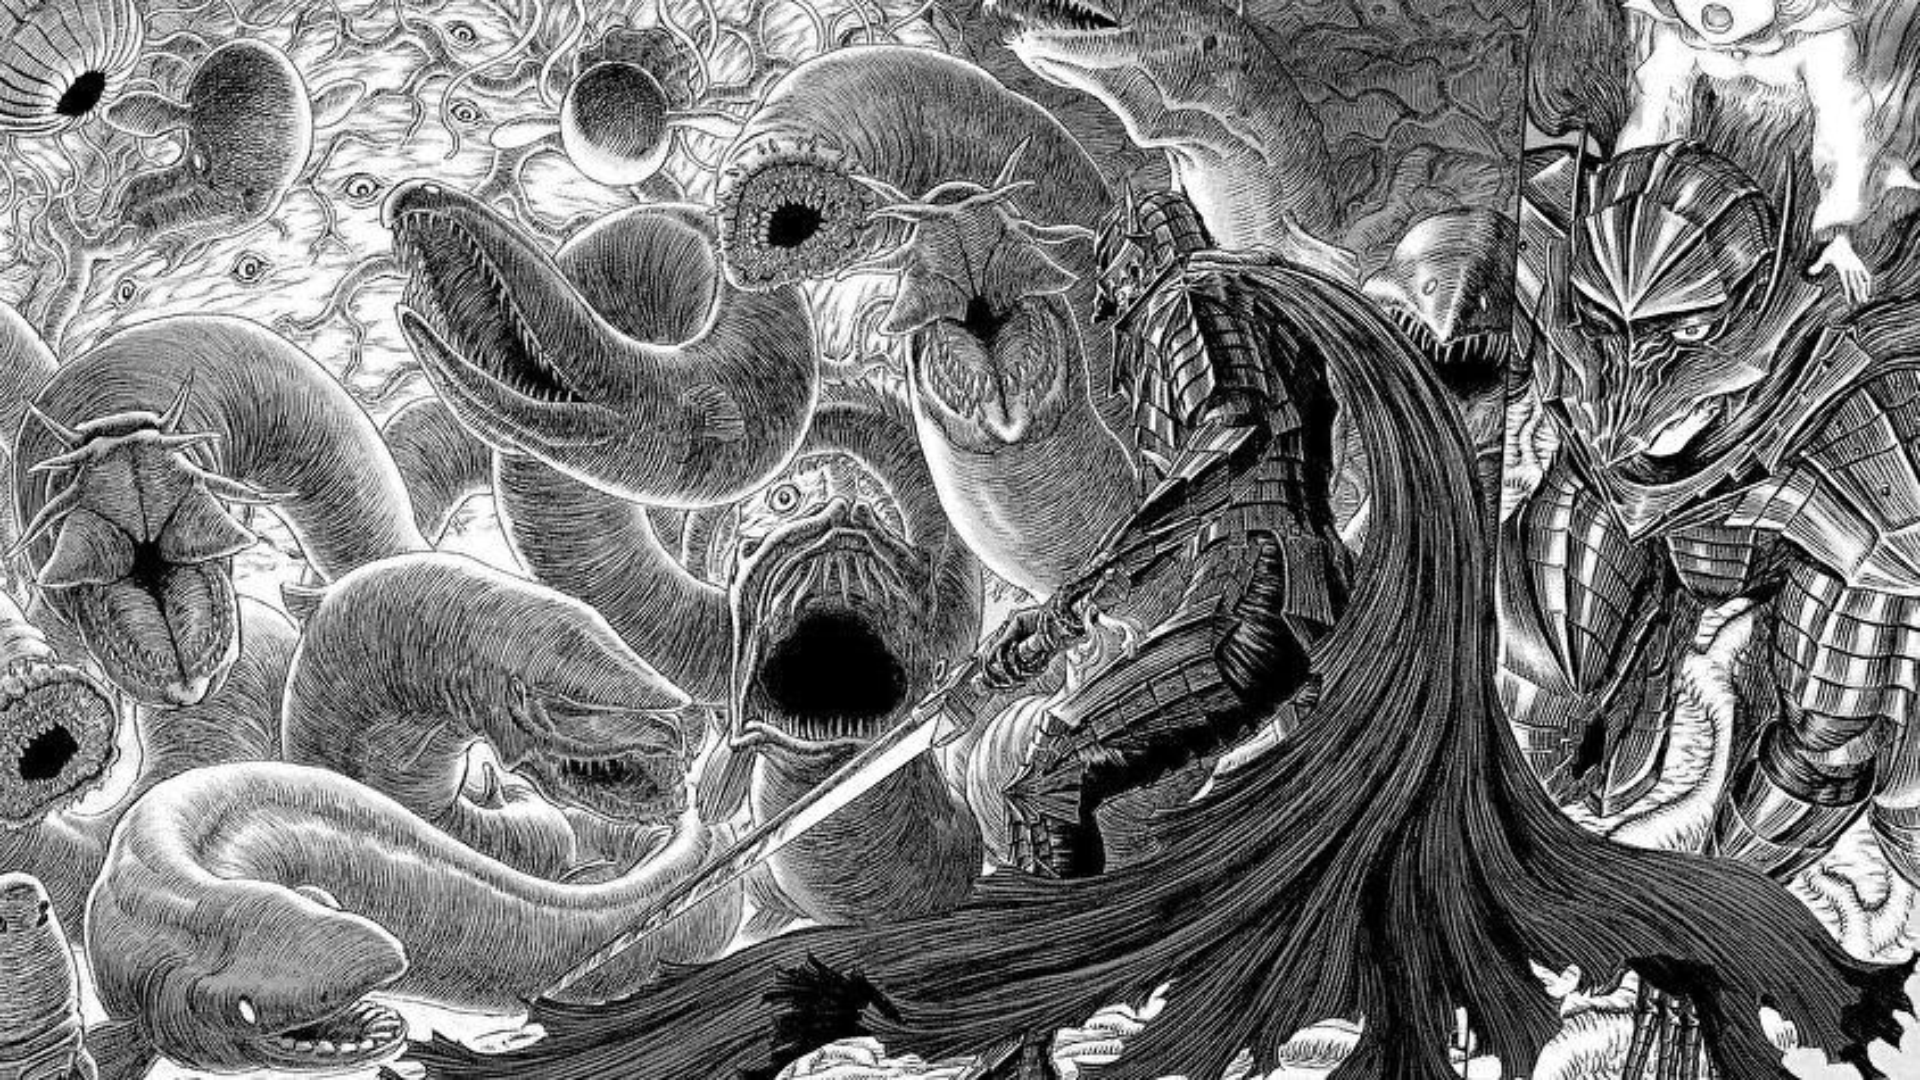 Berserk manga artwork